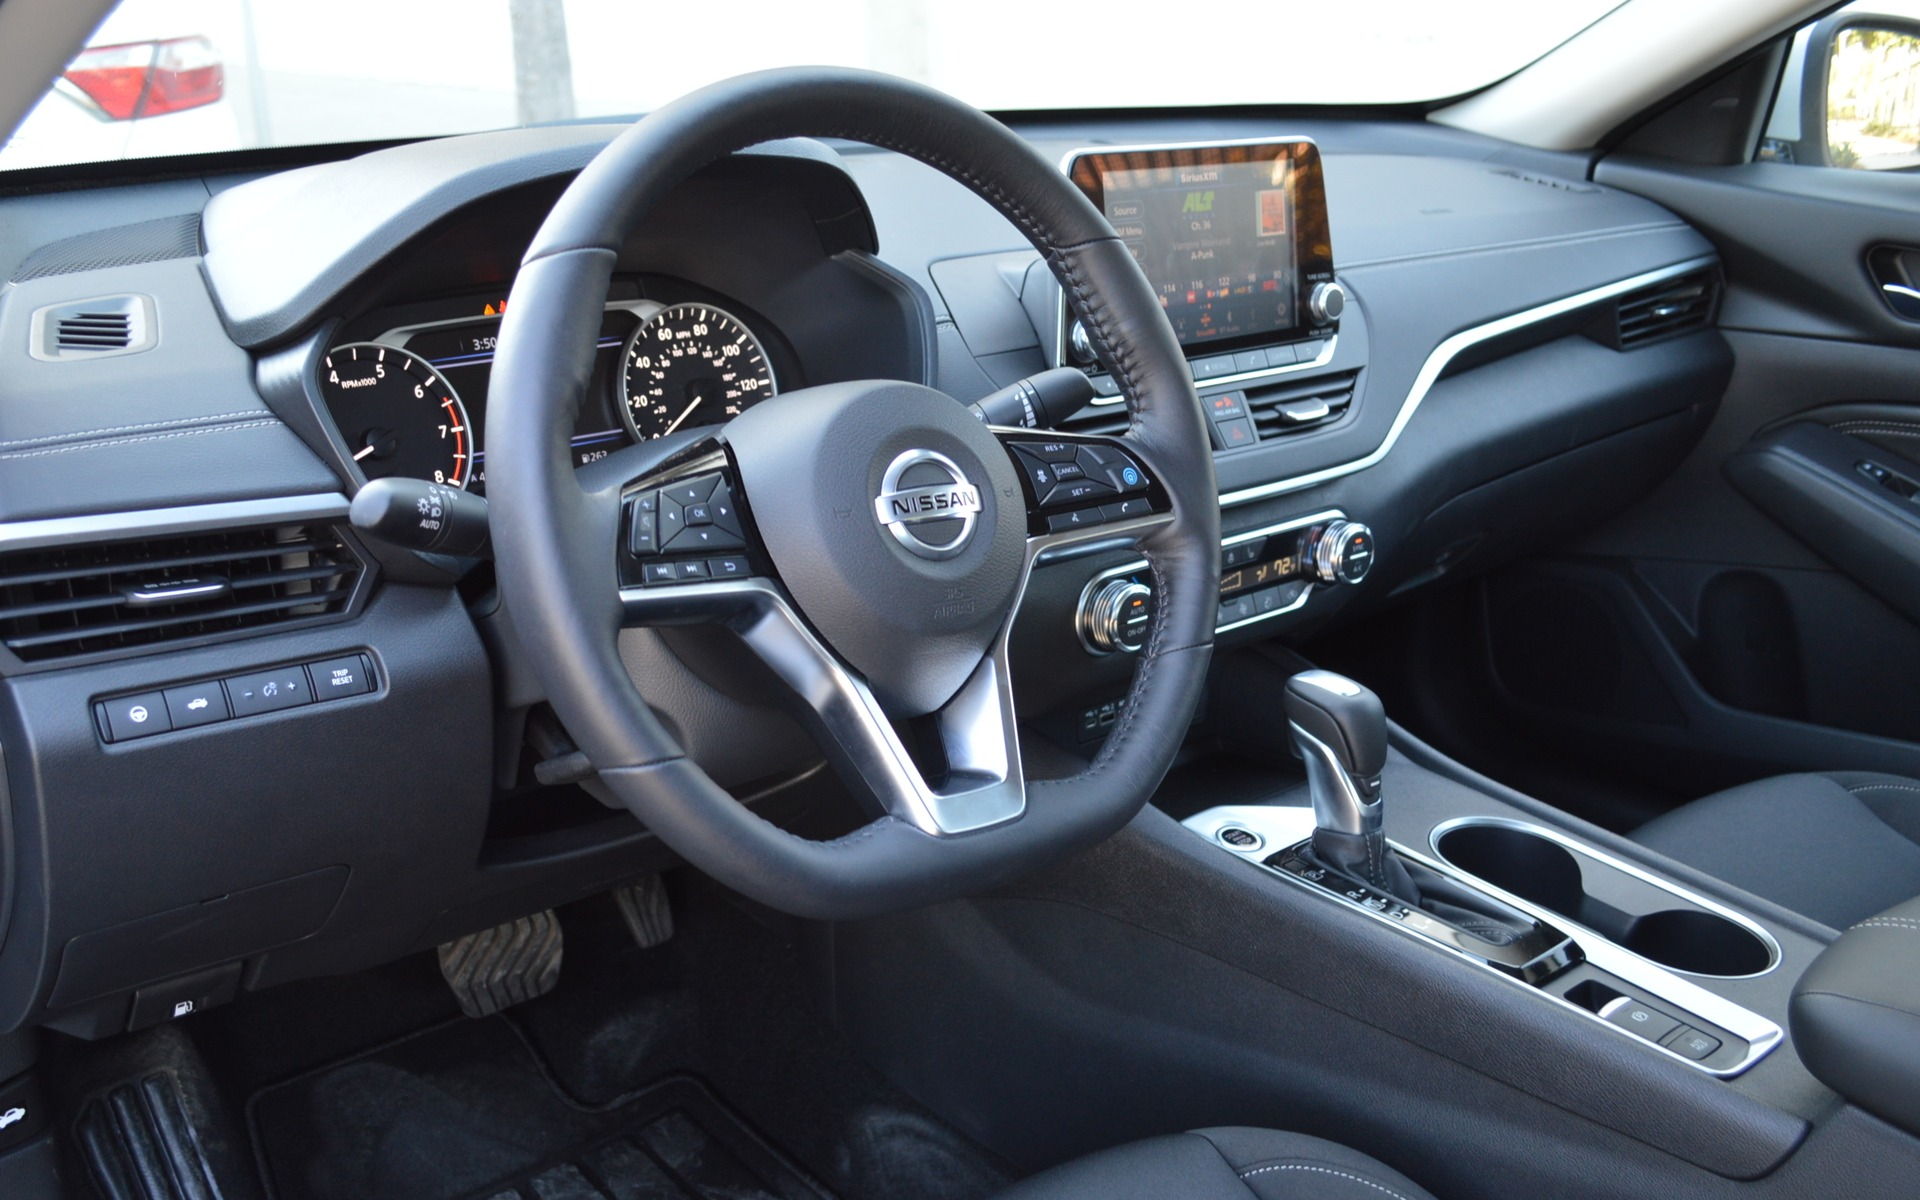 Nissan Altima 2019: enfin un moyen de se distinguer 350273_2019_Nissan_Altima